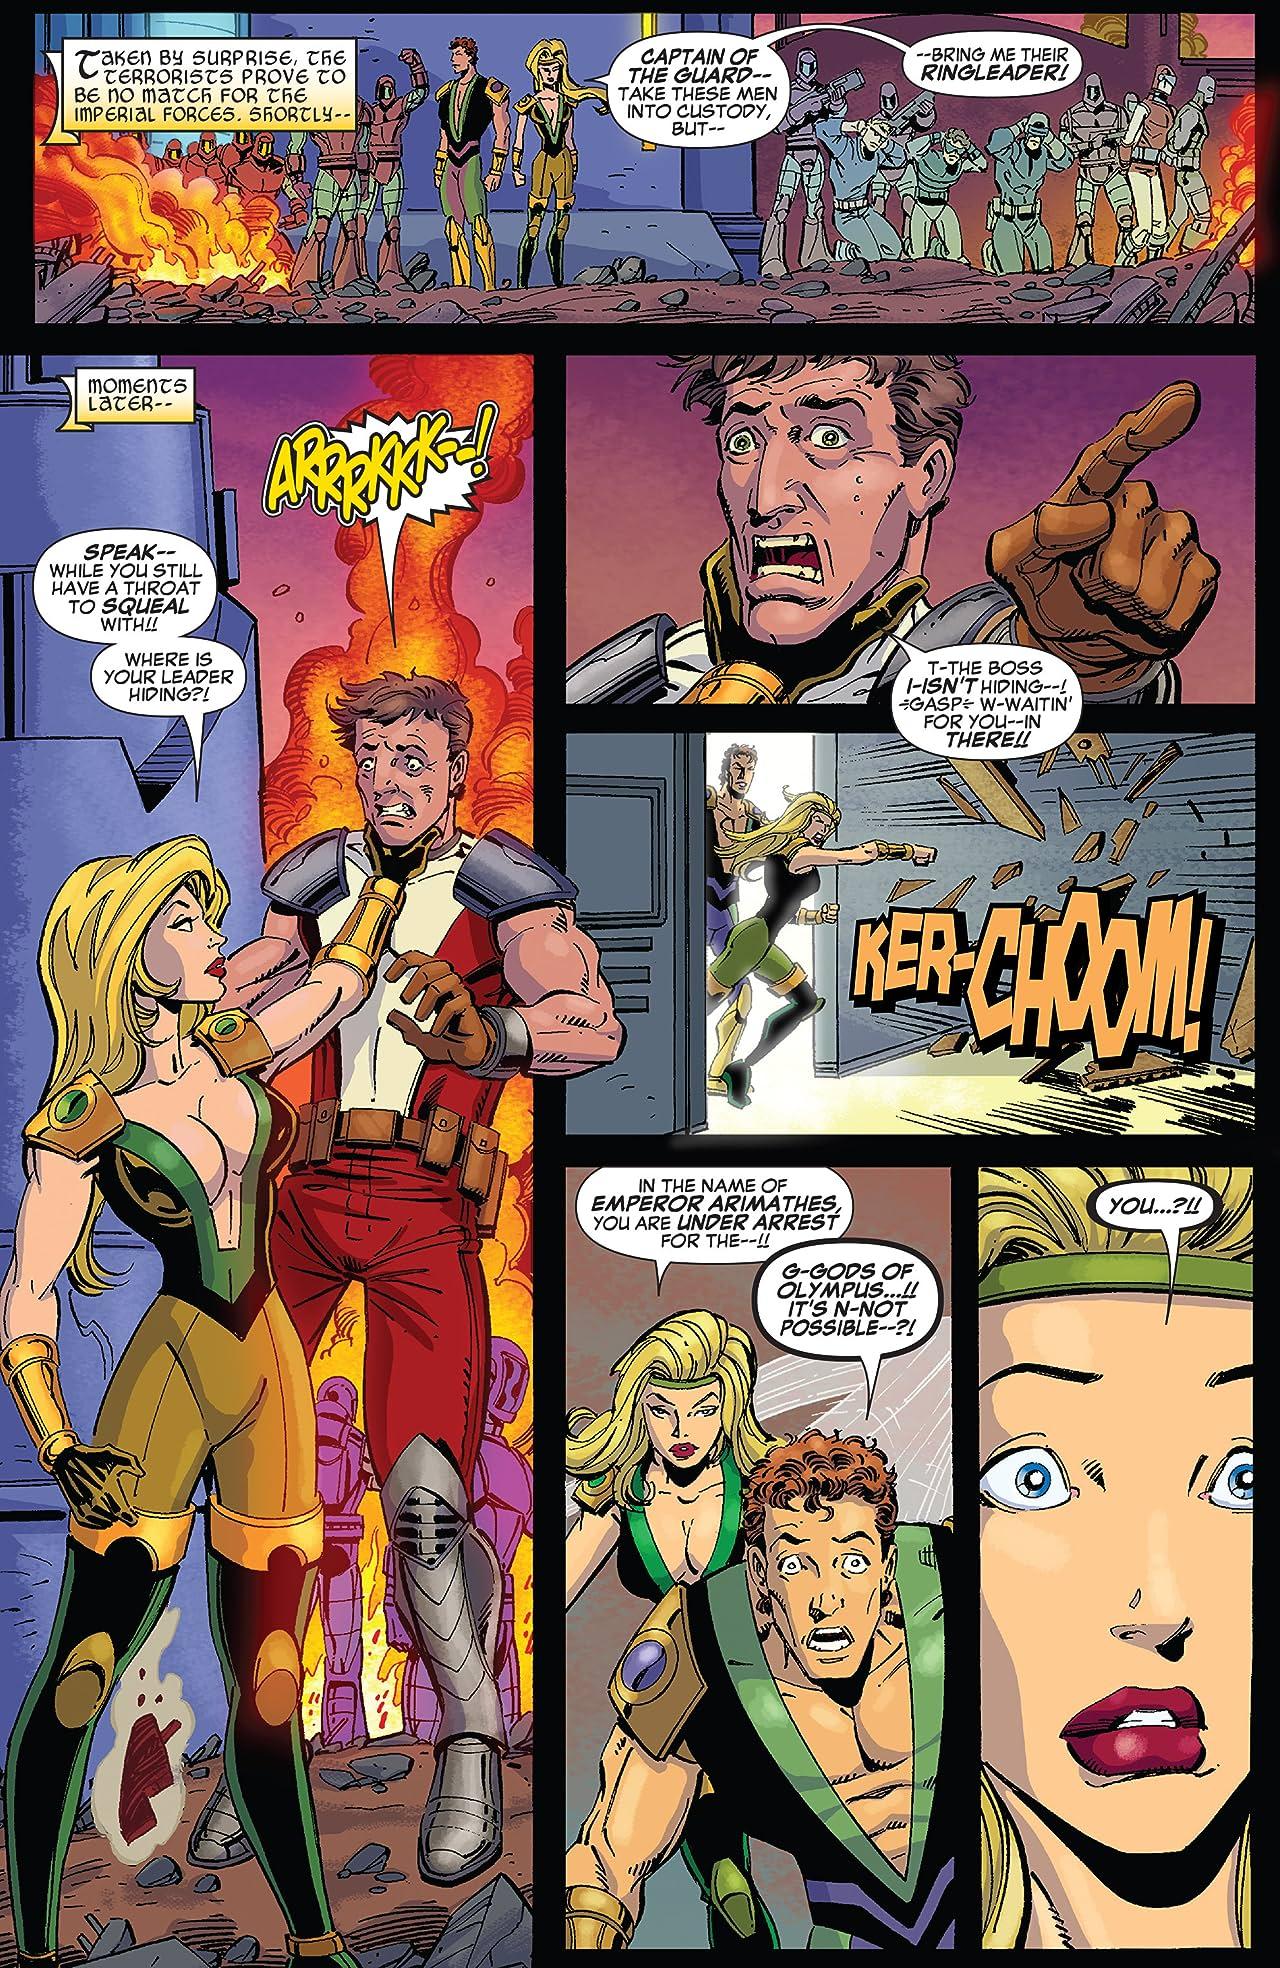 Hercules: Twilight of a God (2010) #4 (of 4)